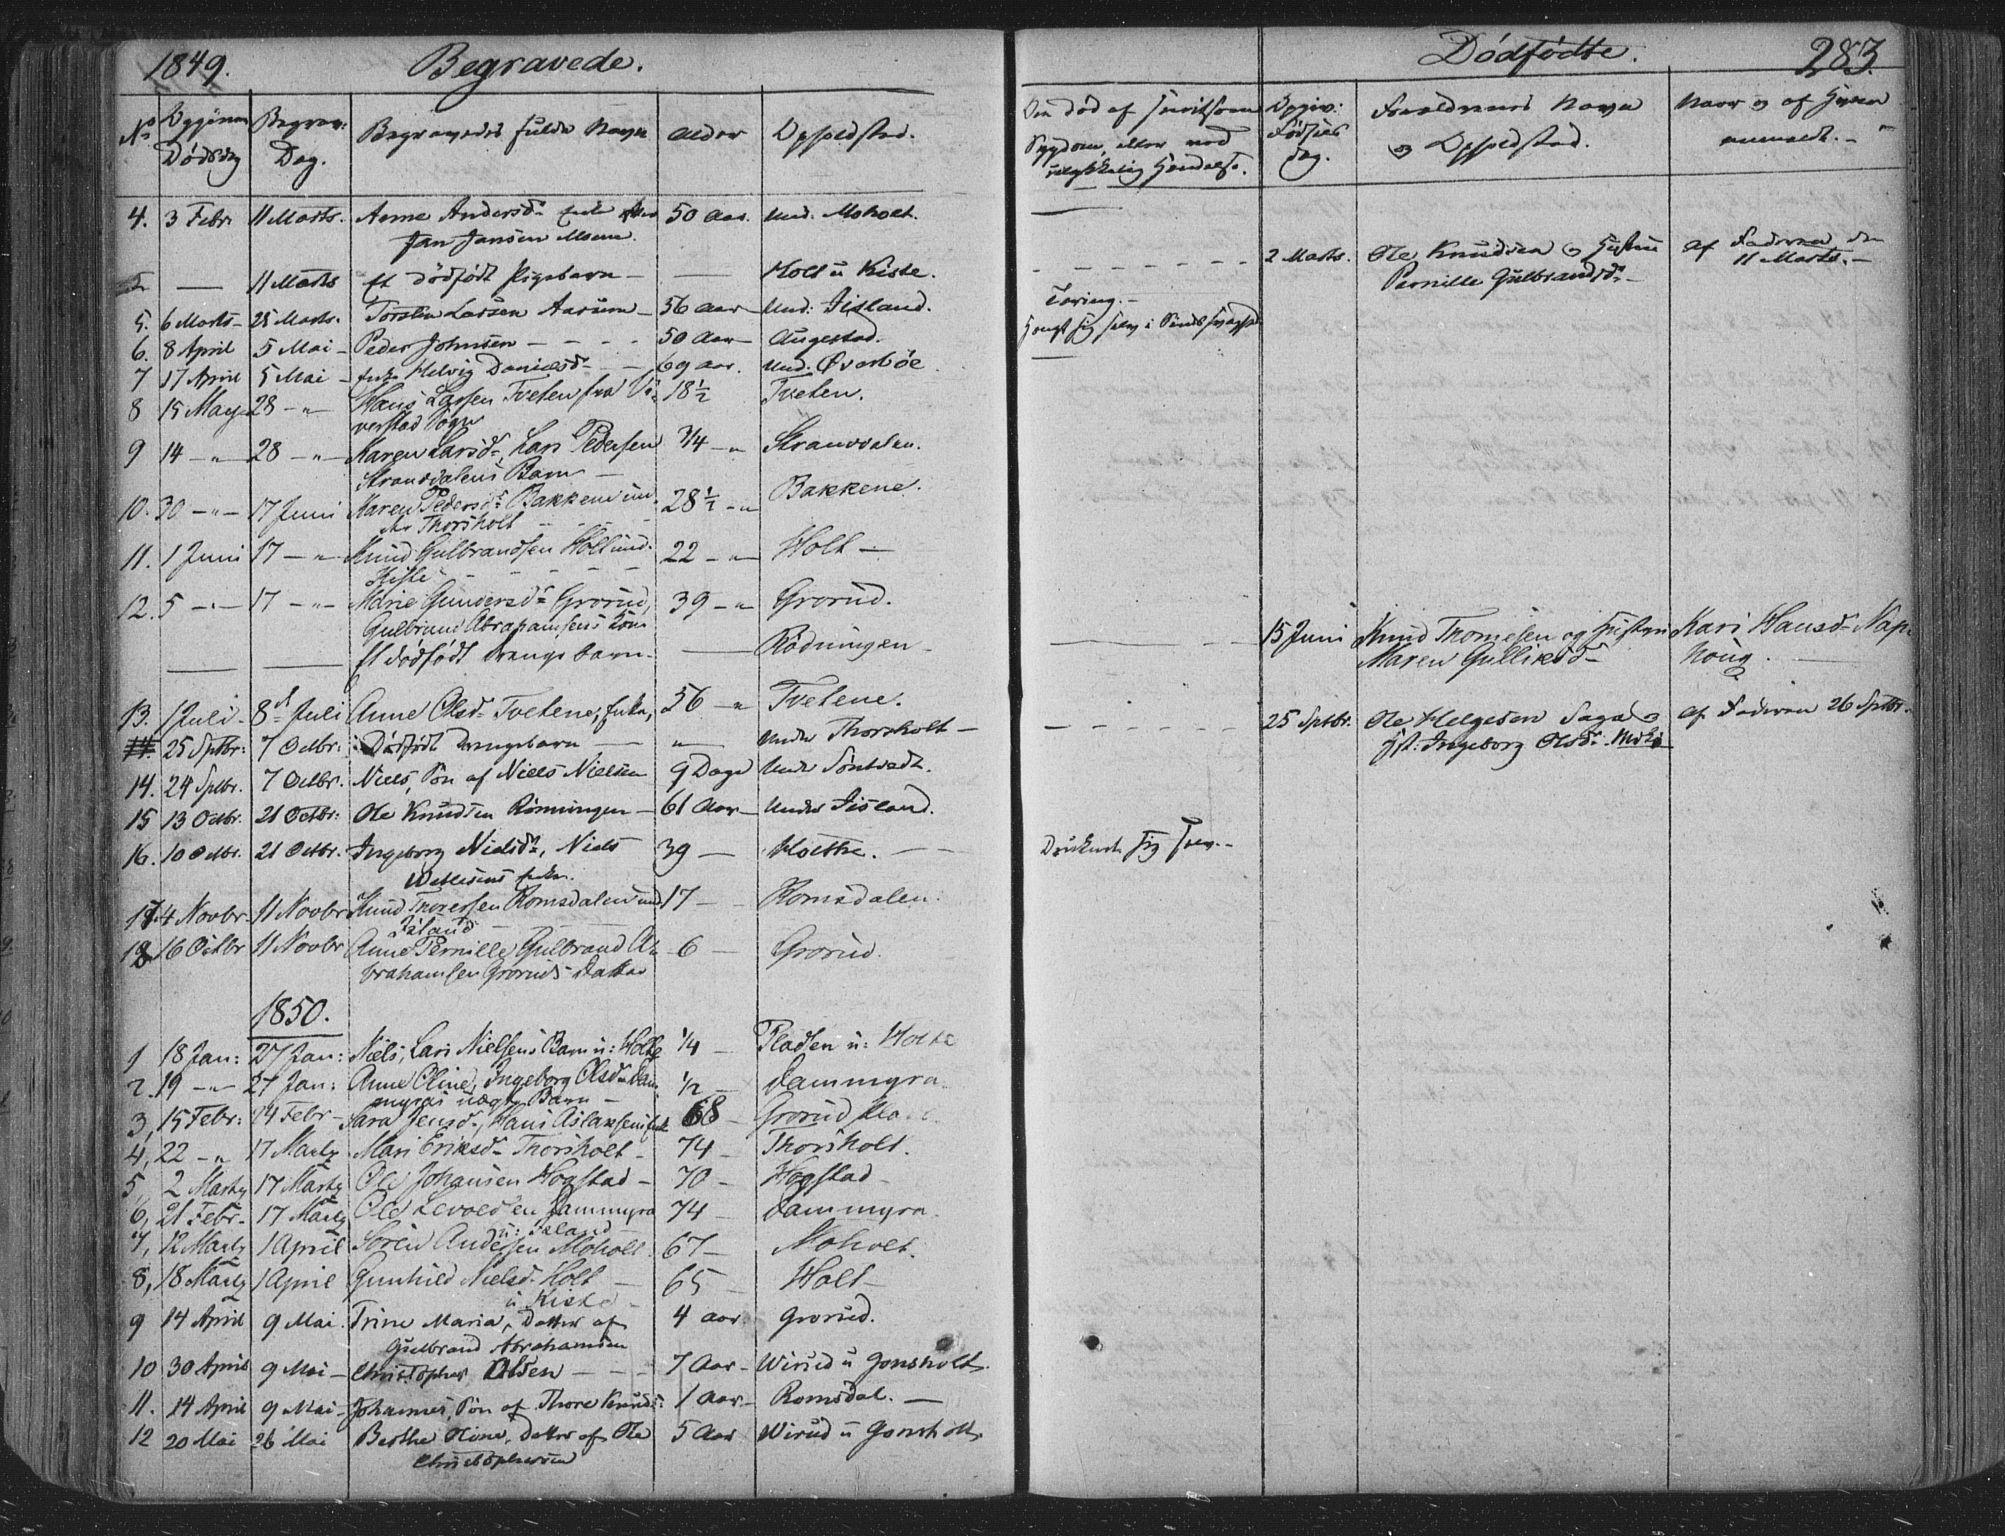 SAKO, Siljan kirkebøker, F/Fa/L0001: Parish register (official) no. 1, 1831-1870, p. 283